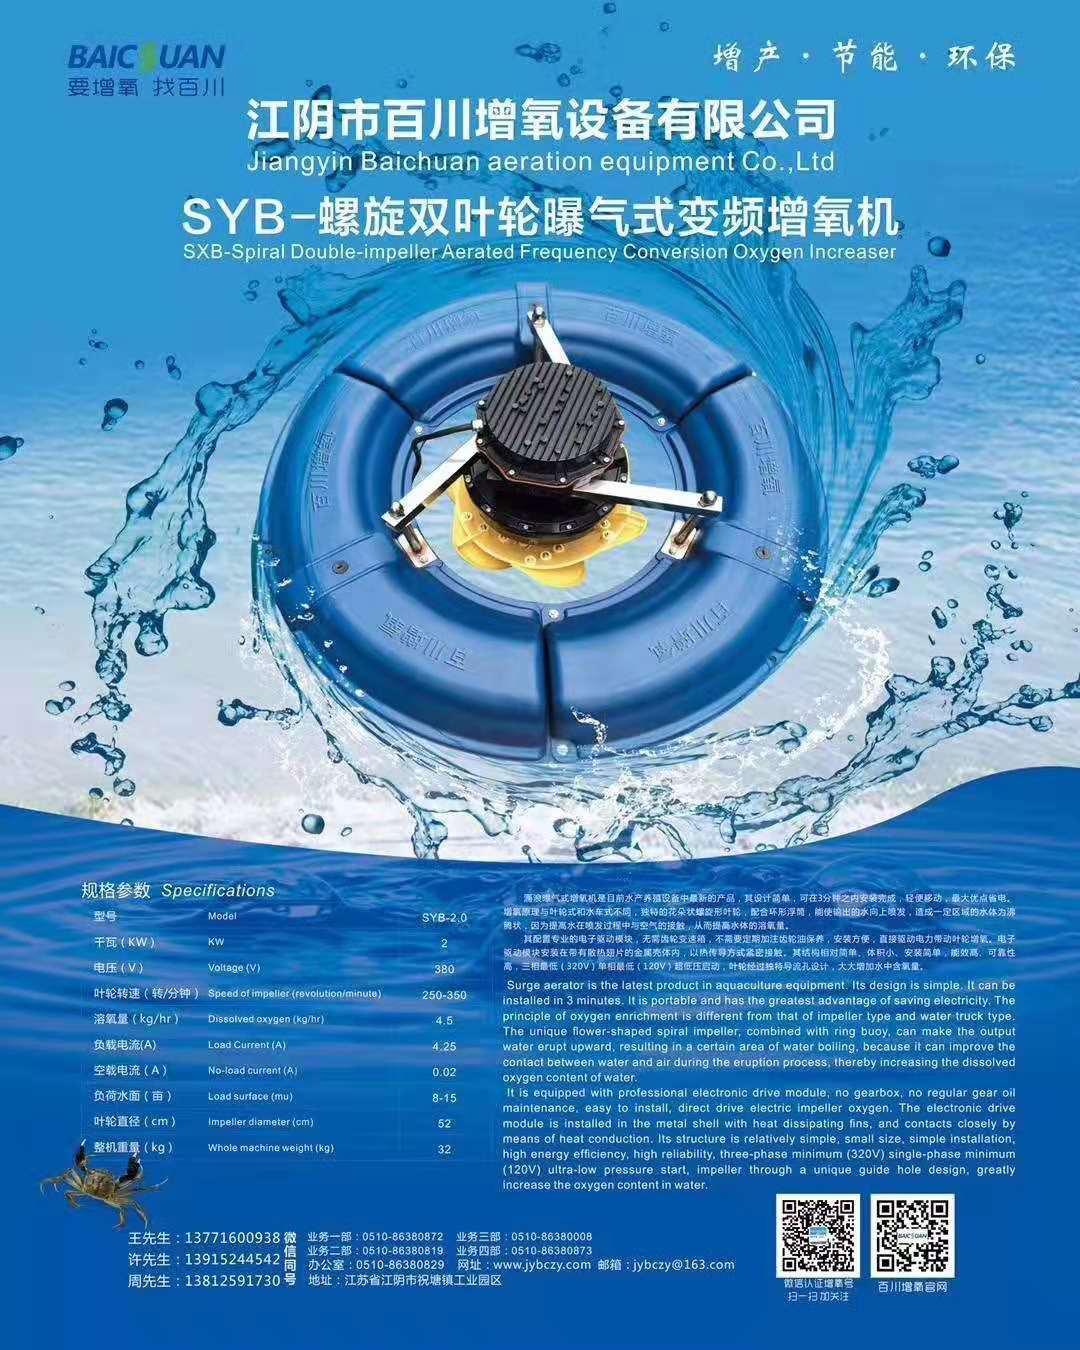 SYB-螺旋雙葉輪曝氣式變頻增氧機 3